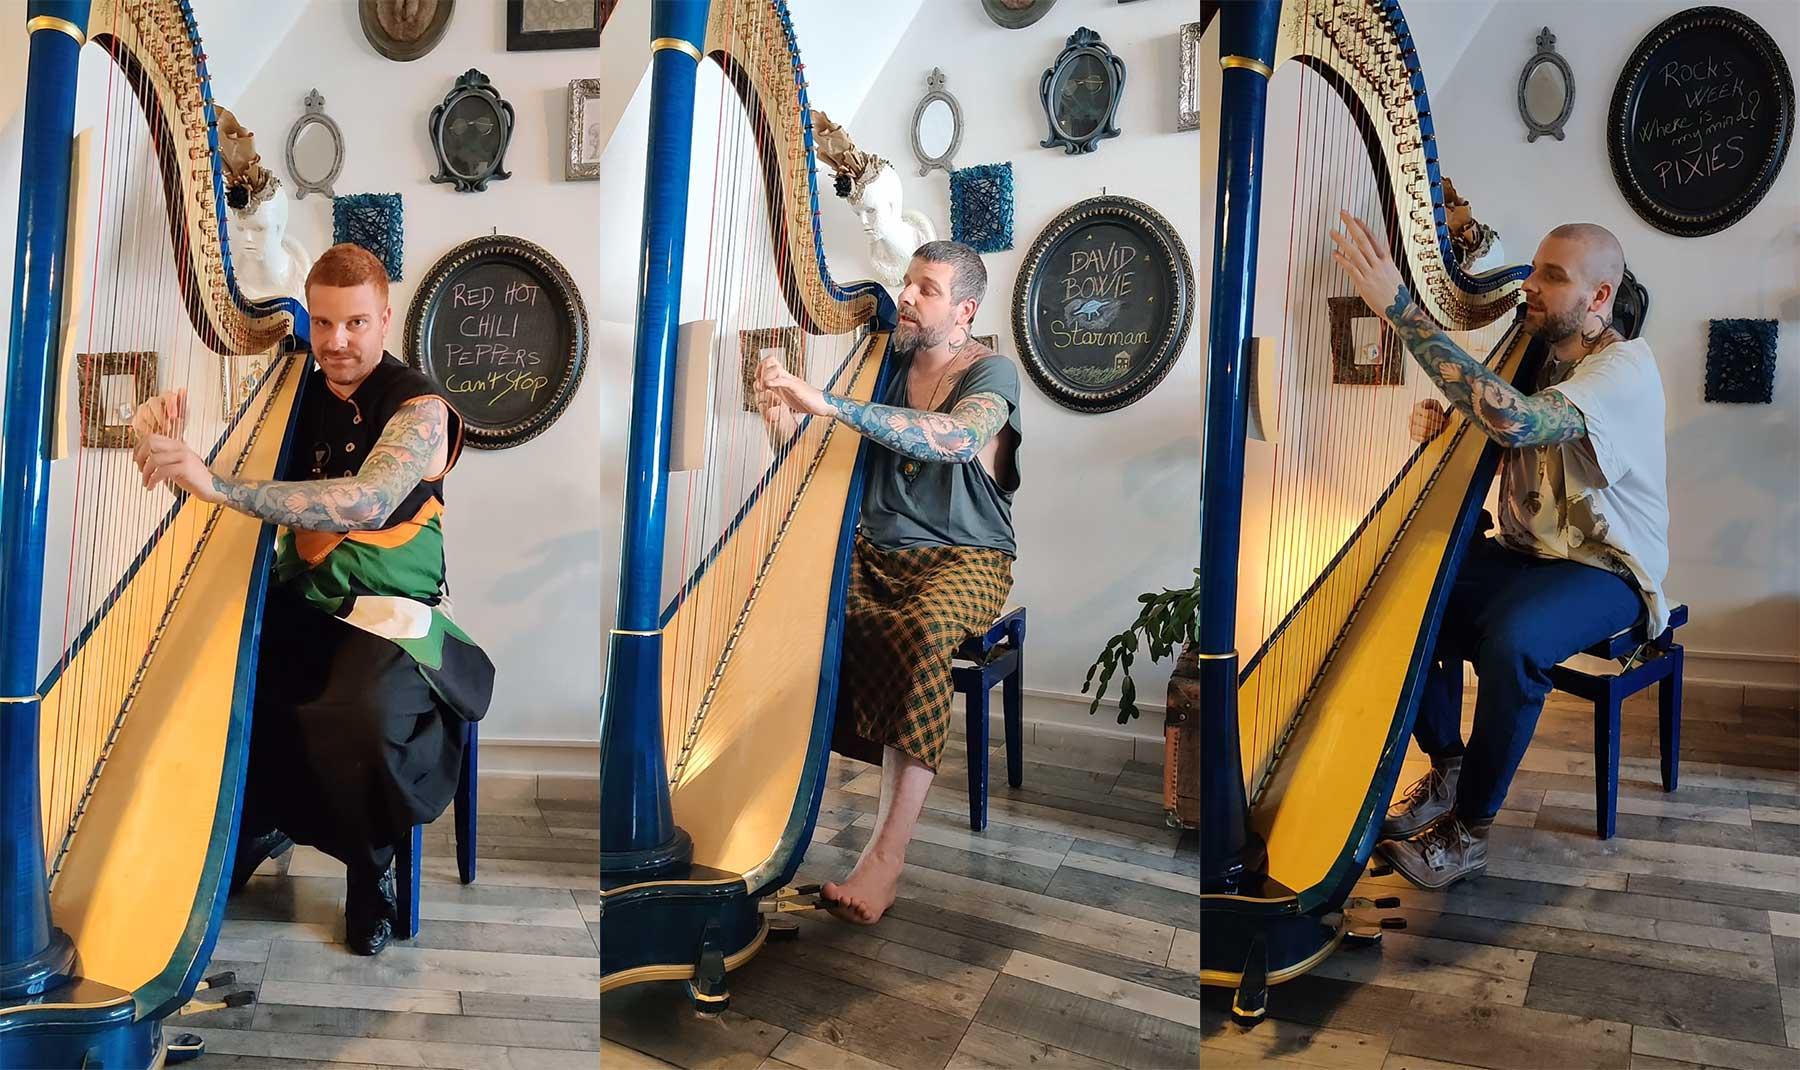 Maël Isaac spielt Rock-Klassiker auf der Harfe